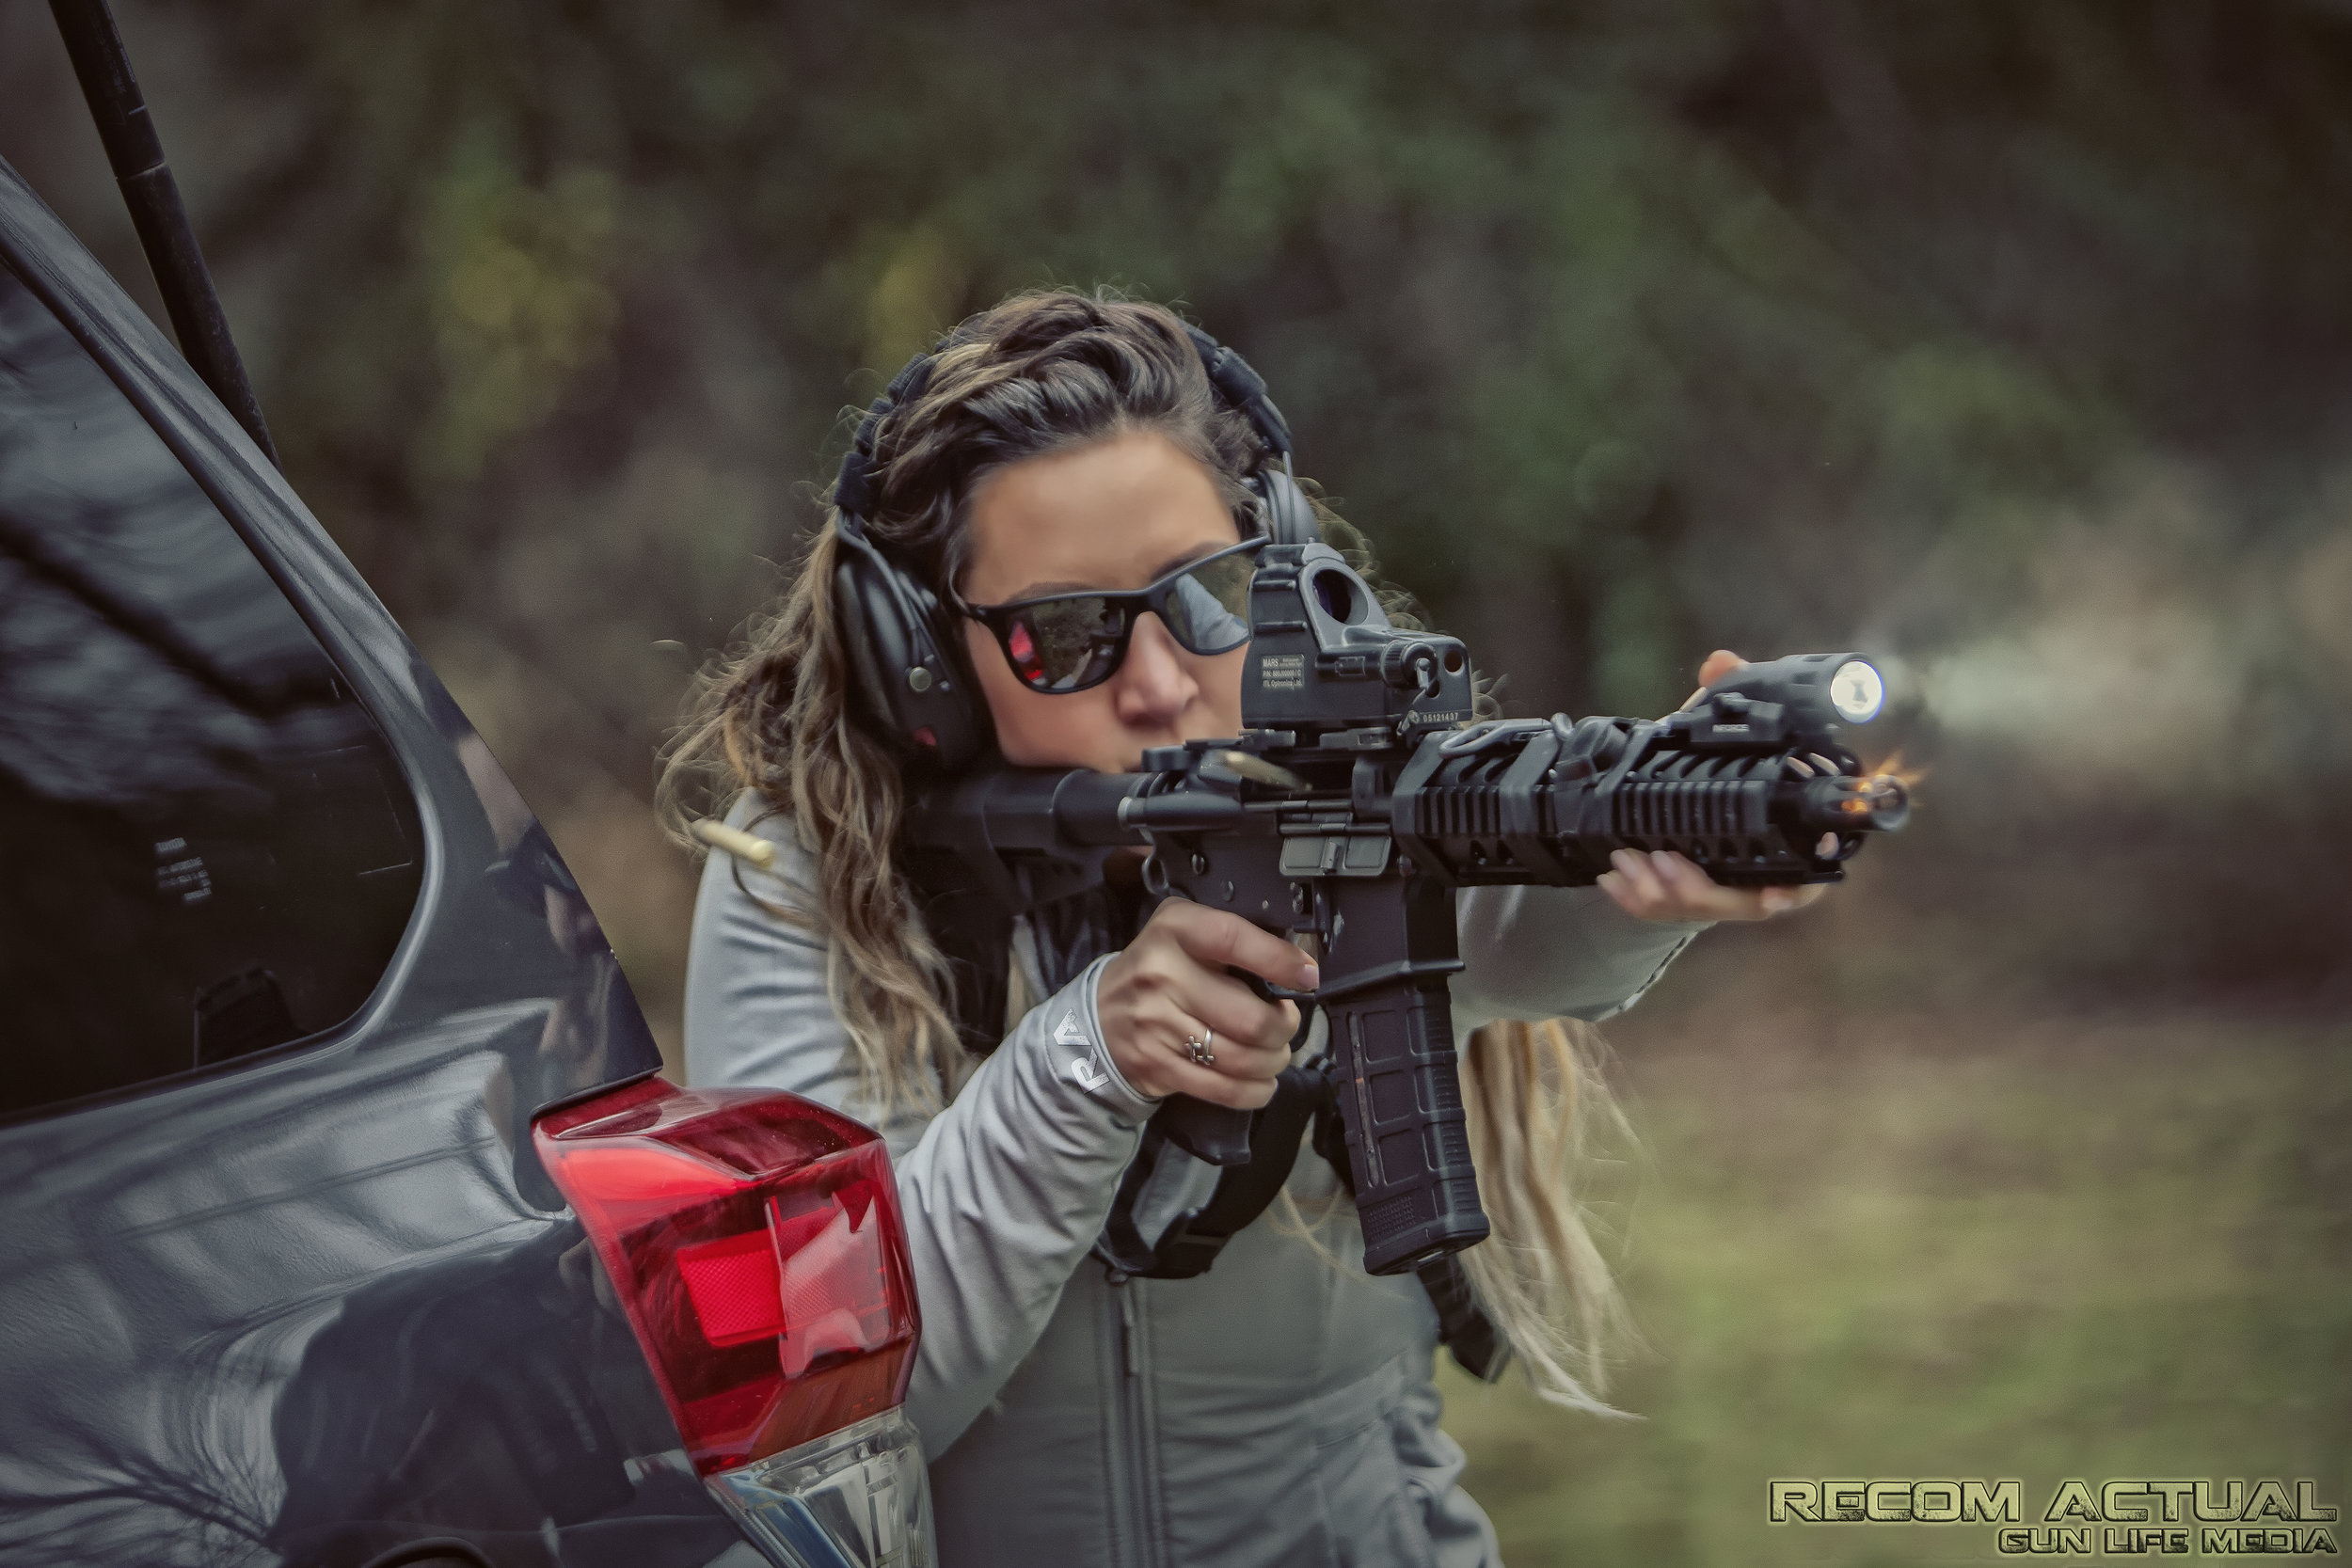 RA_INFORCE_ROSE_MATT_Pistol_1.3.jpg